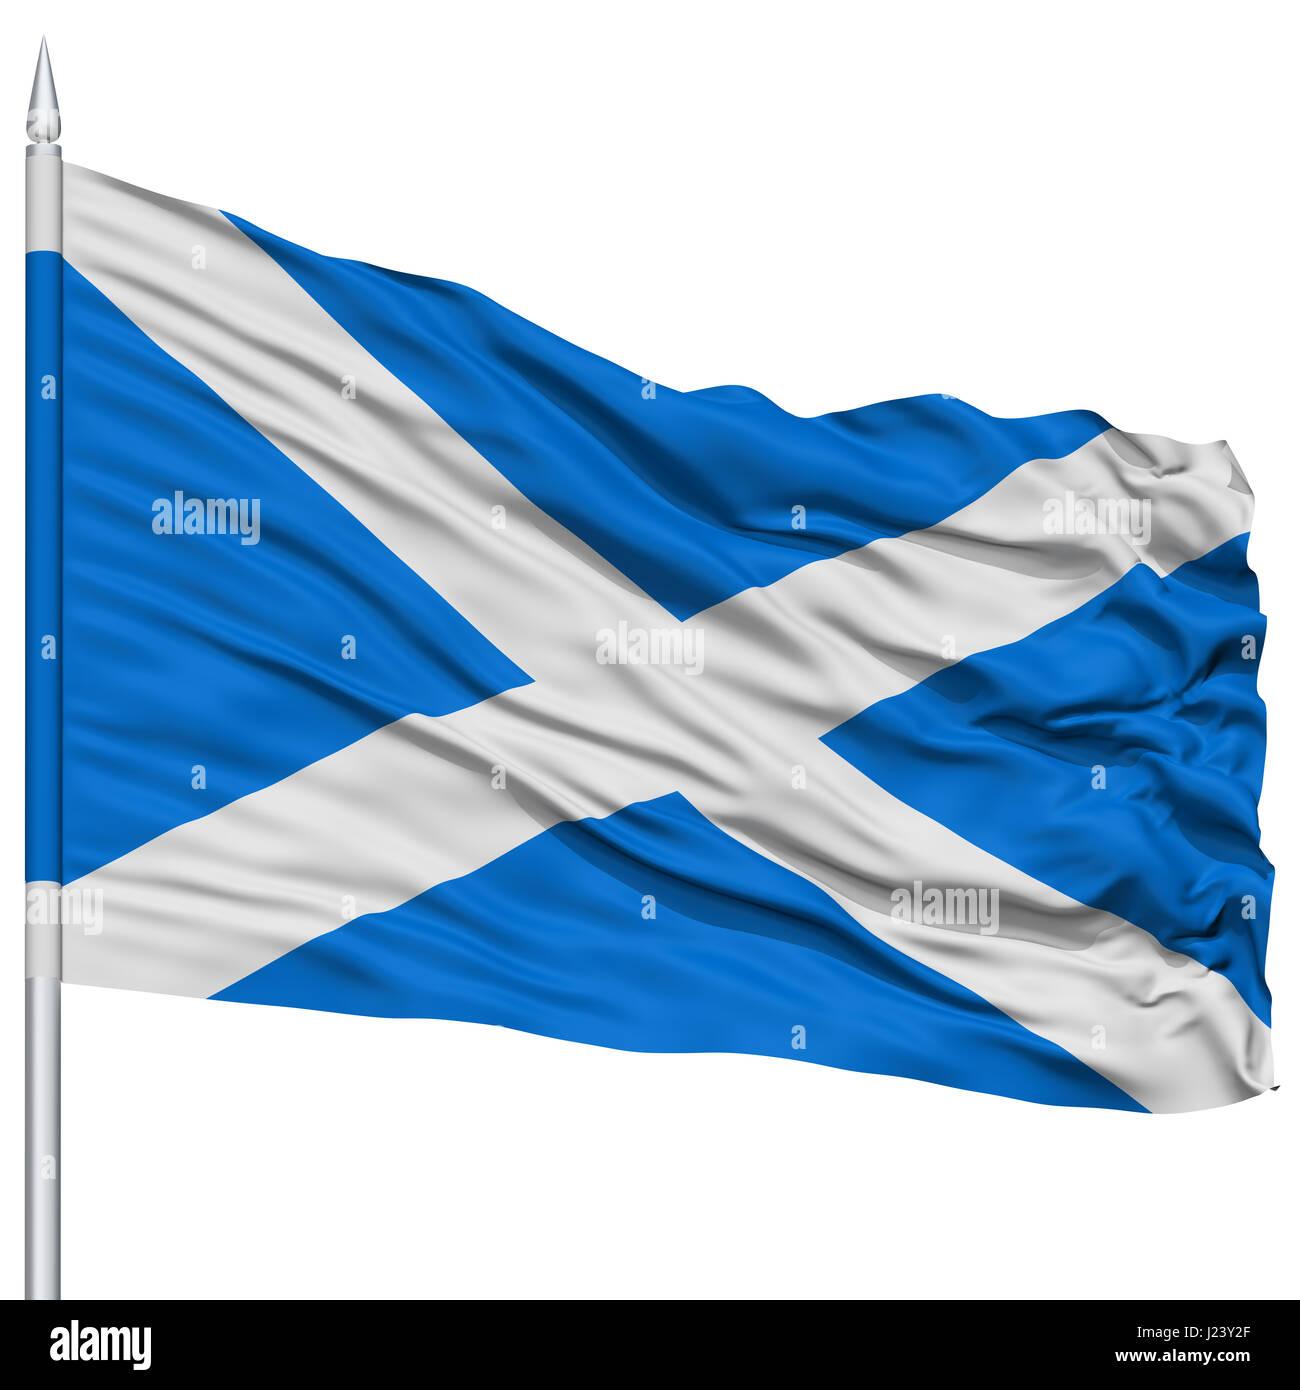 blue cross flag stock photos u0026 blue cross flag stock images alamy